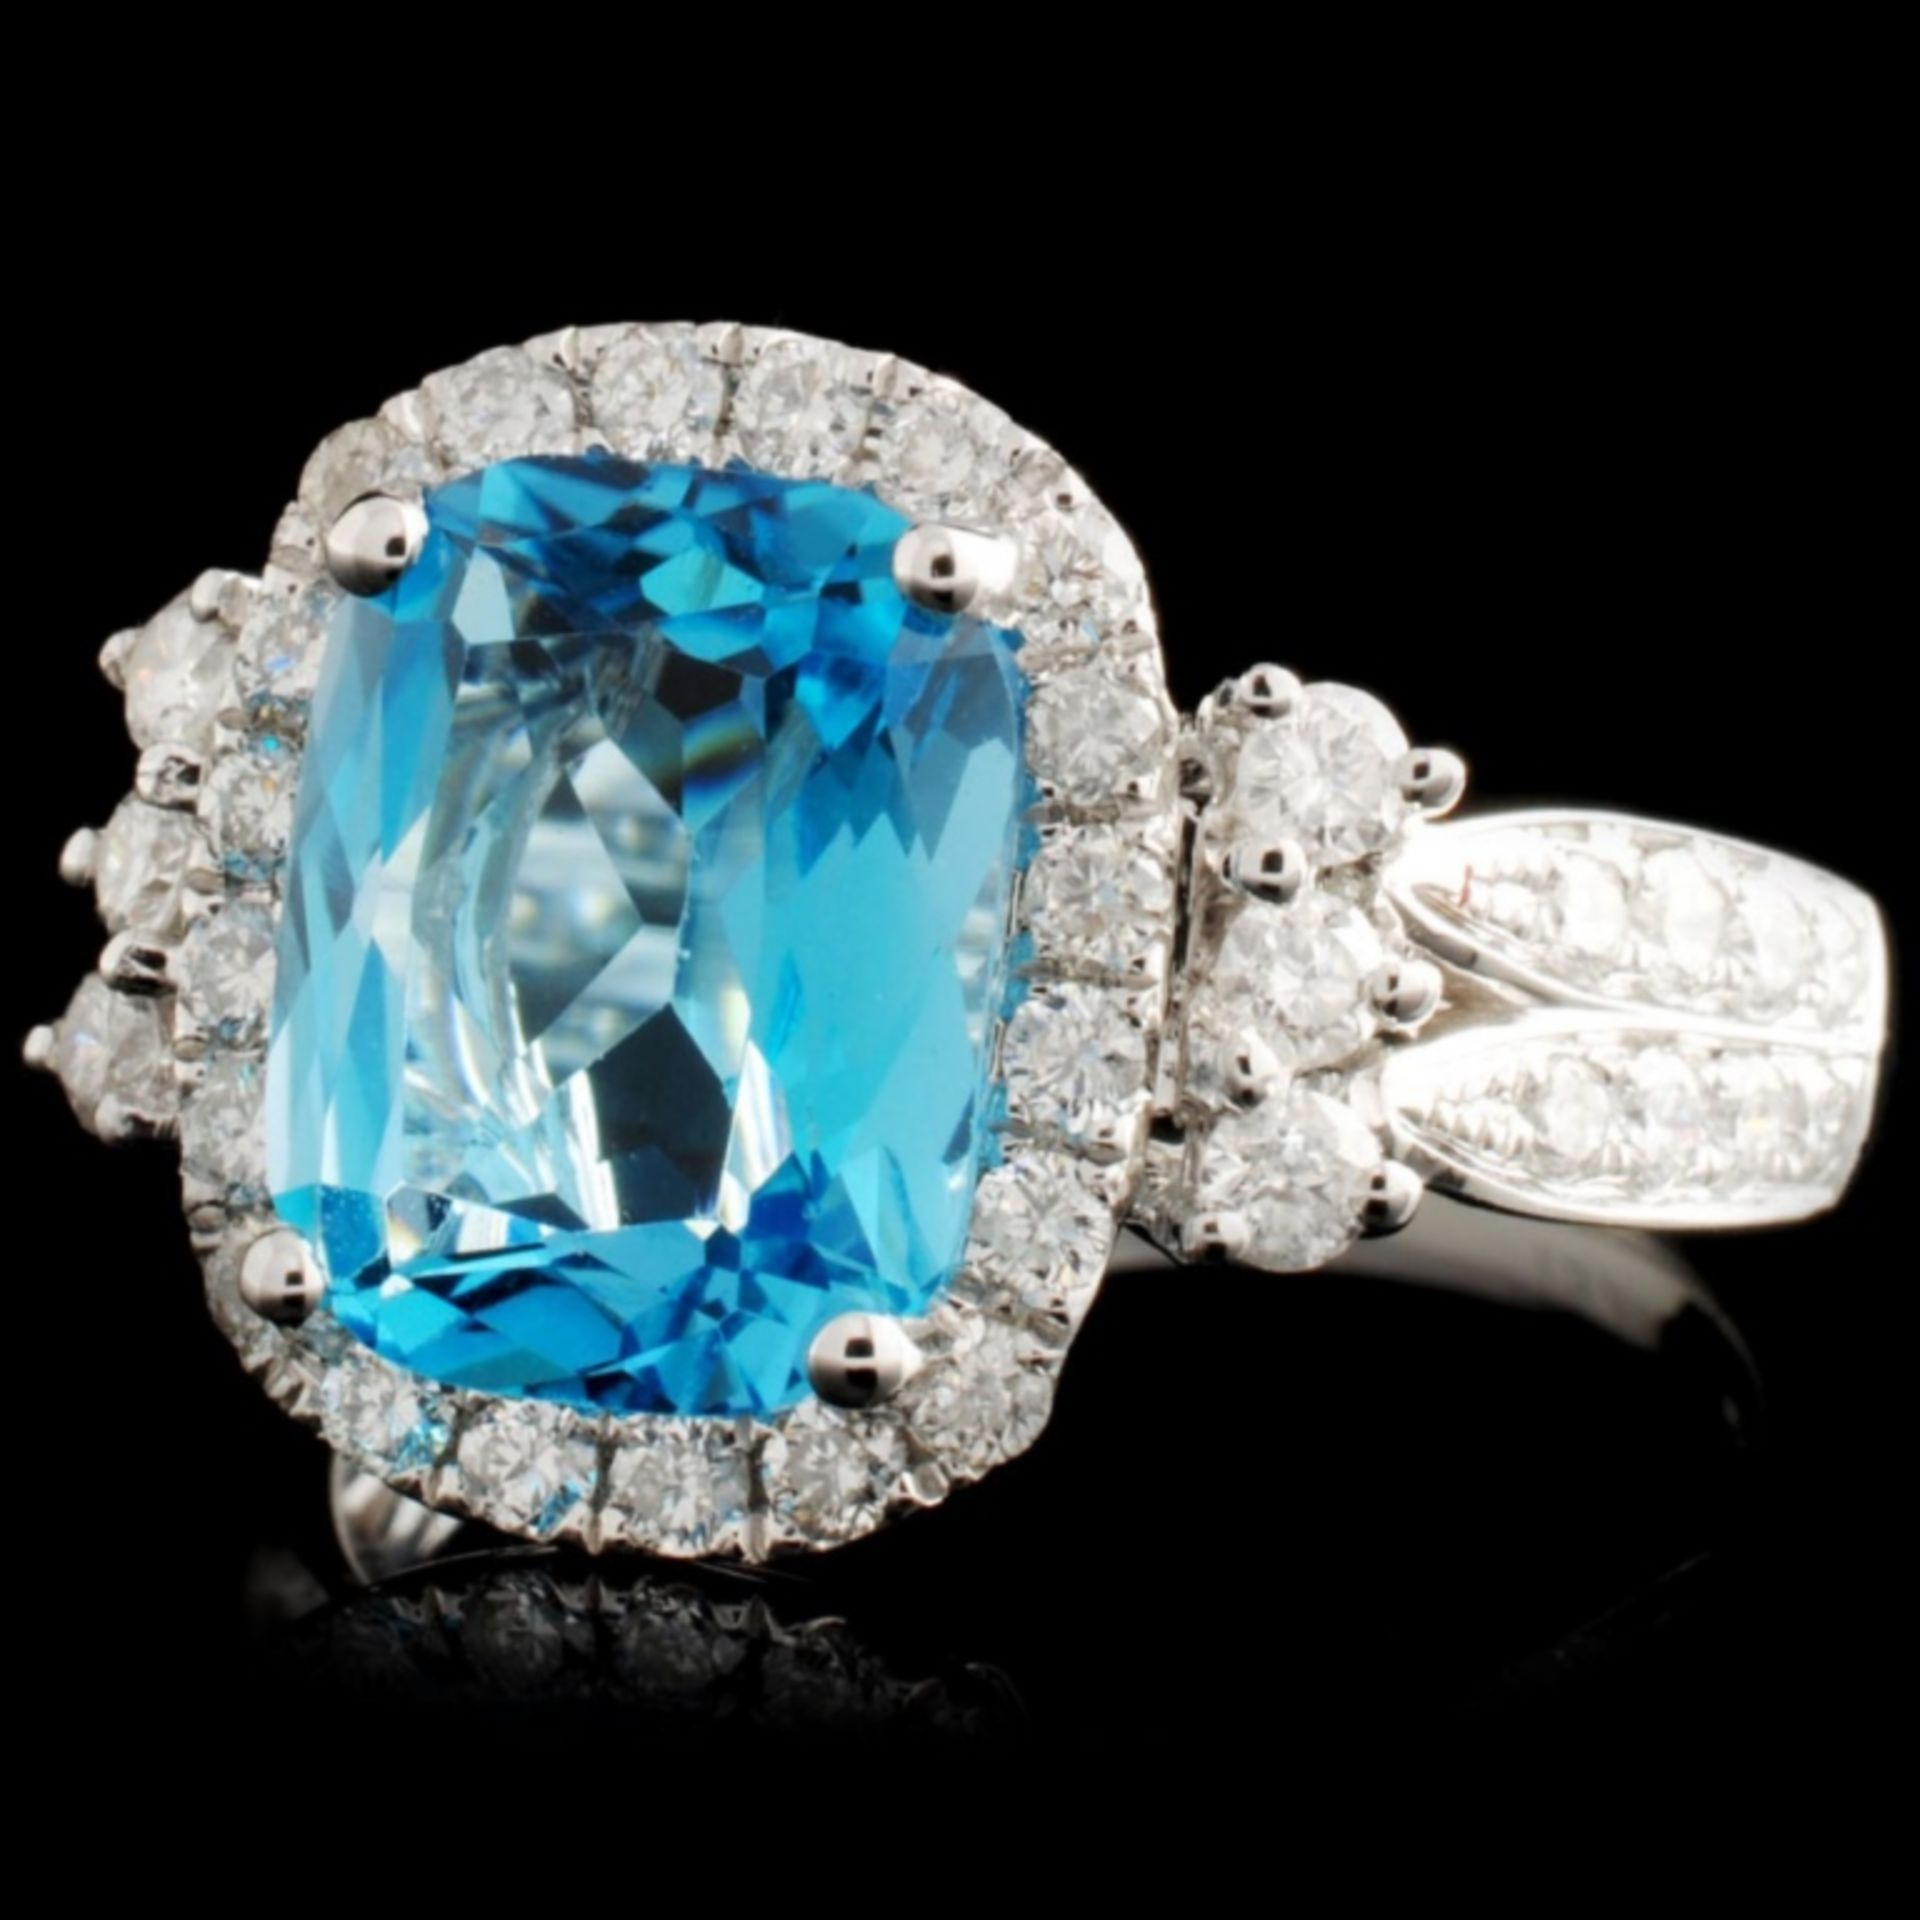 14K Gold 3.42ct Topaz & 0.74ctw Diamond Ring - Image 2 of 3